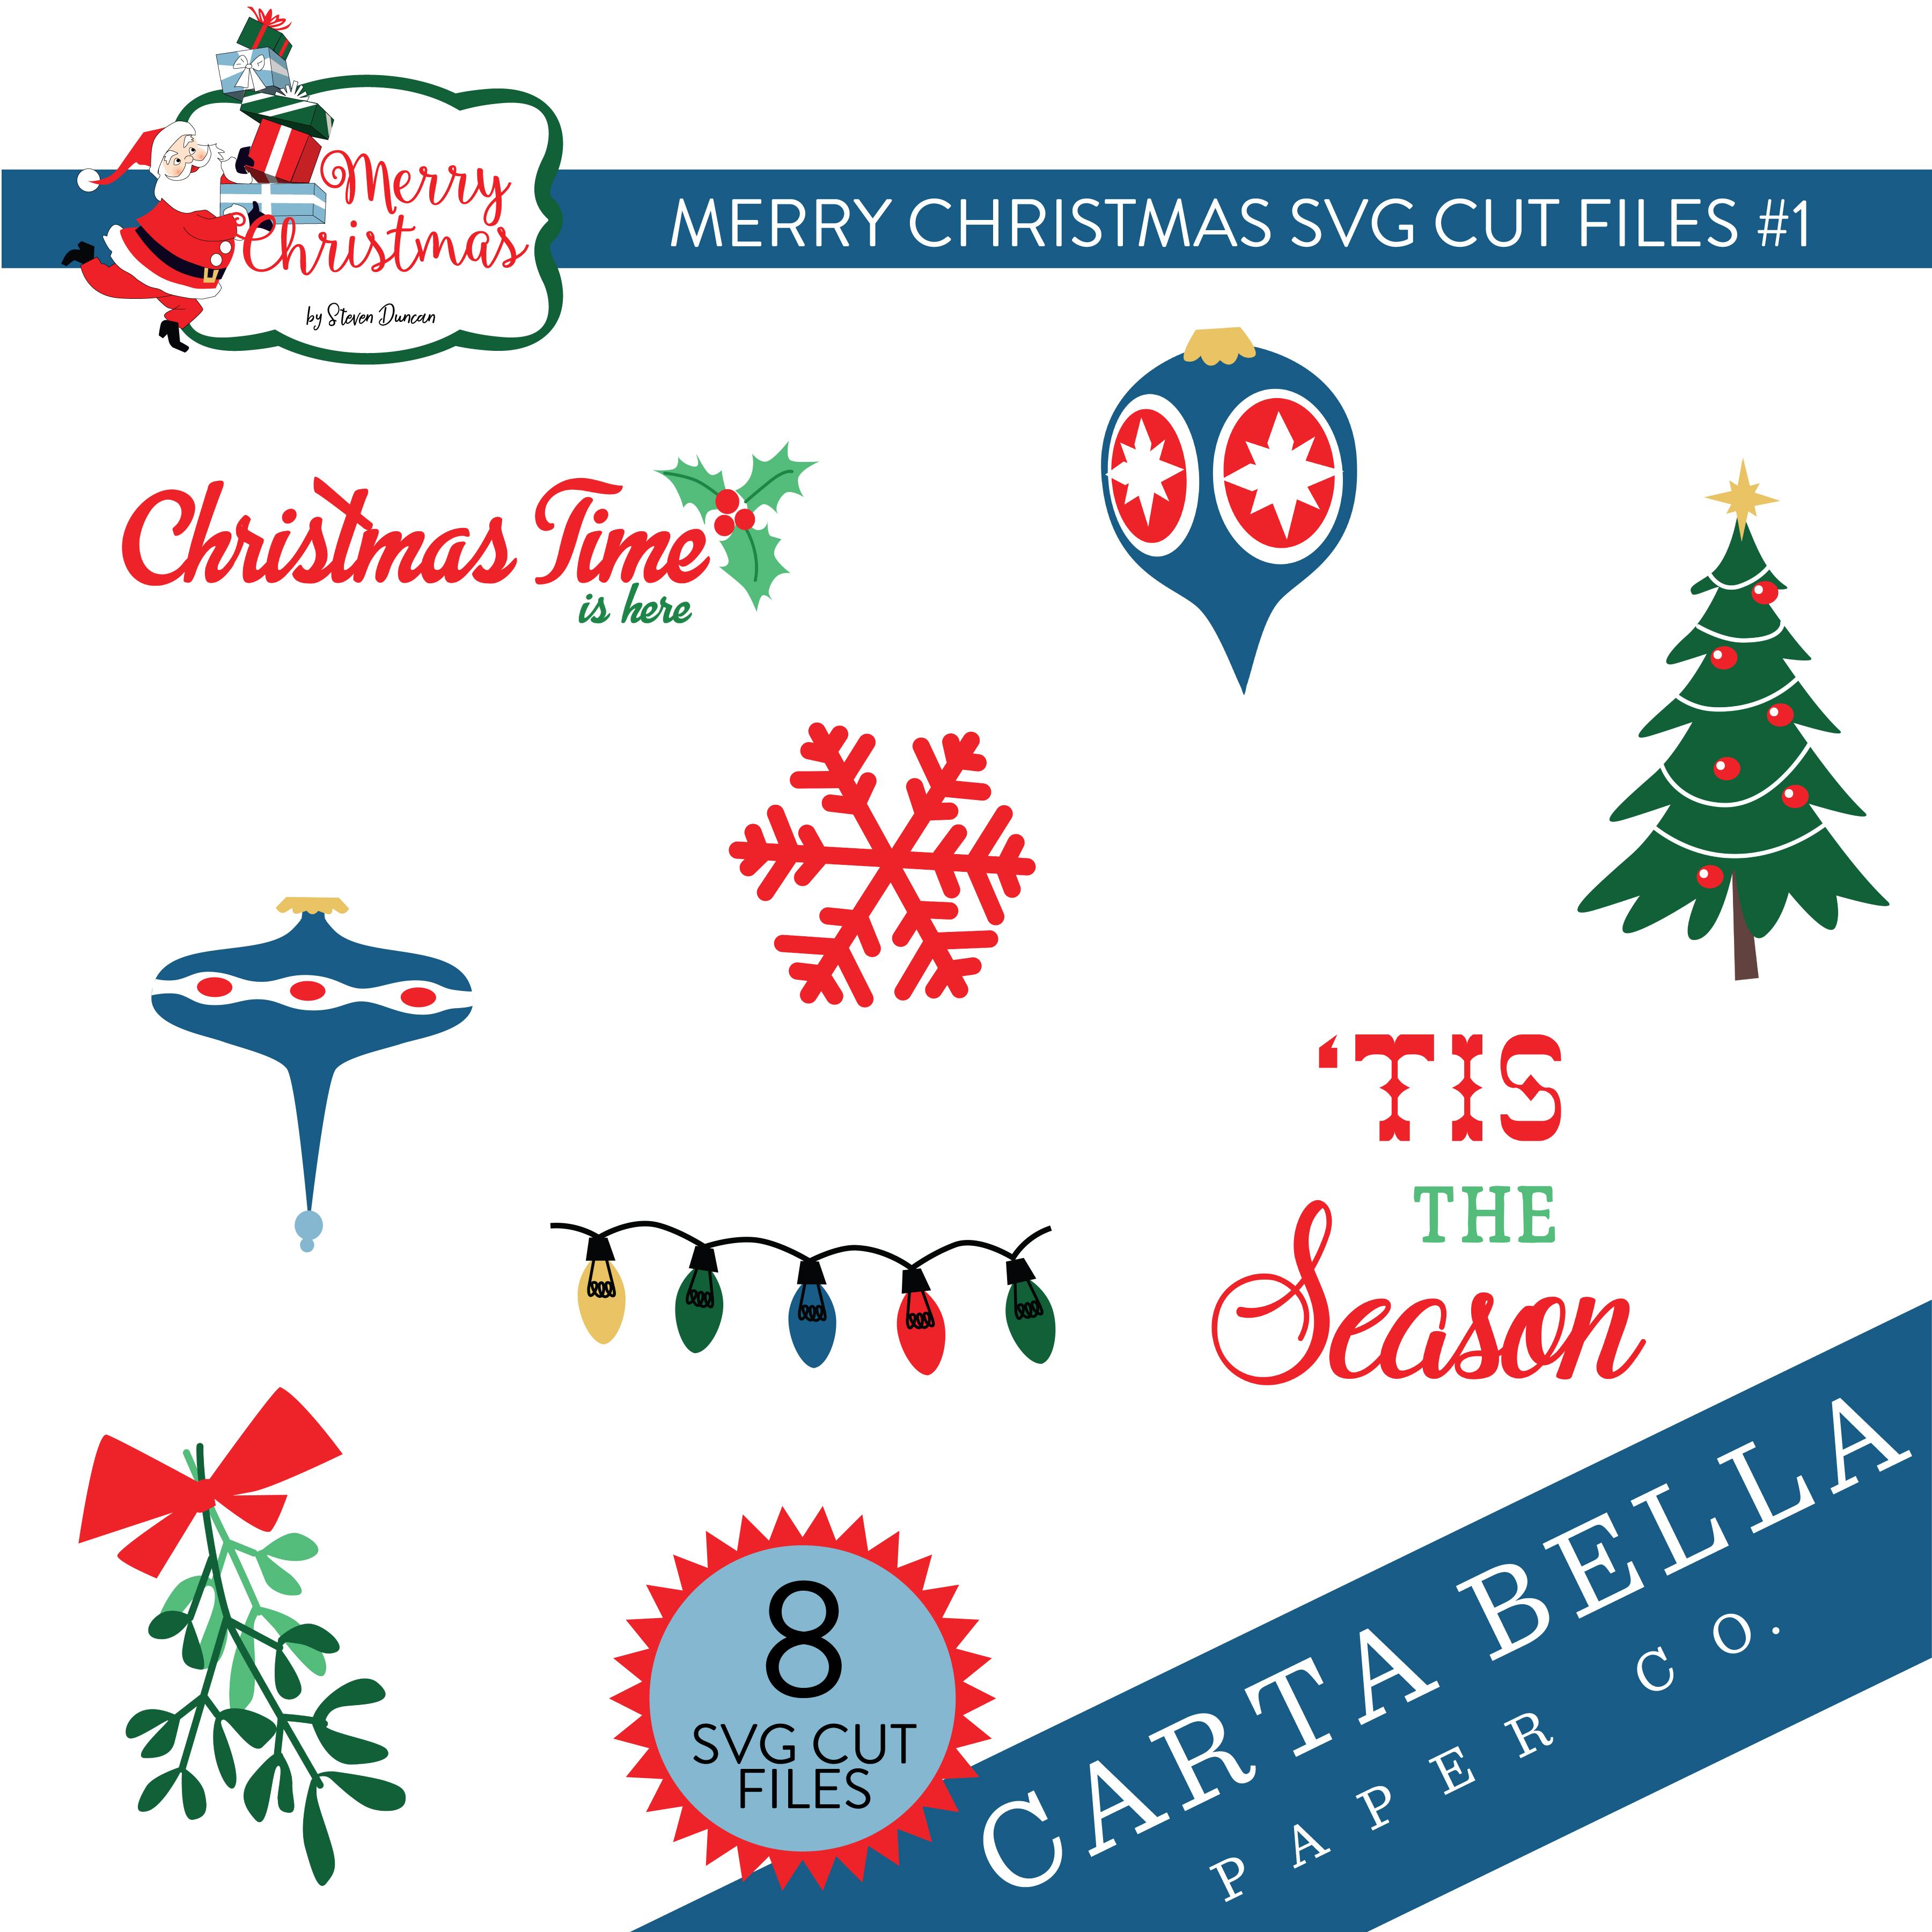 Merry Christmas SVG Cut Files #1